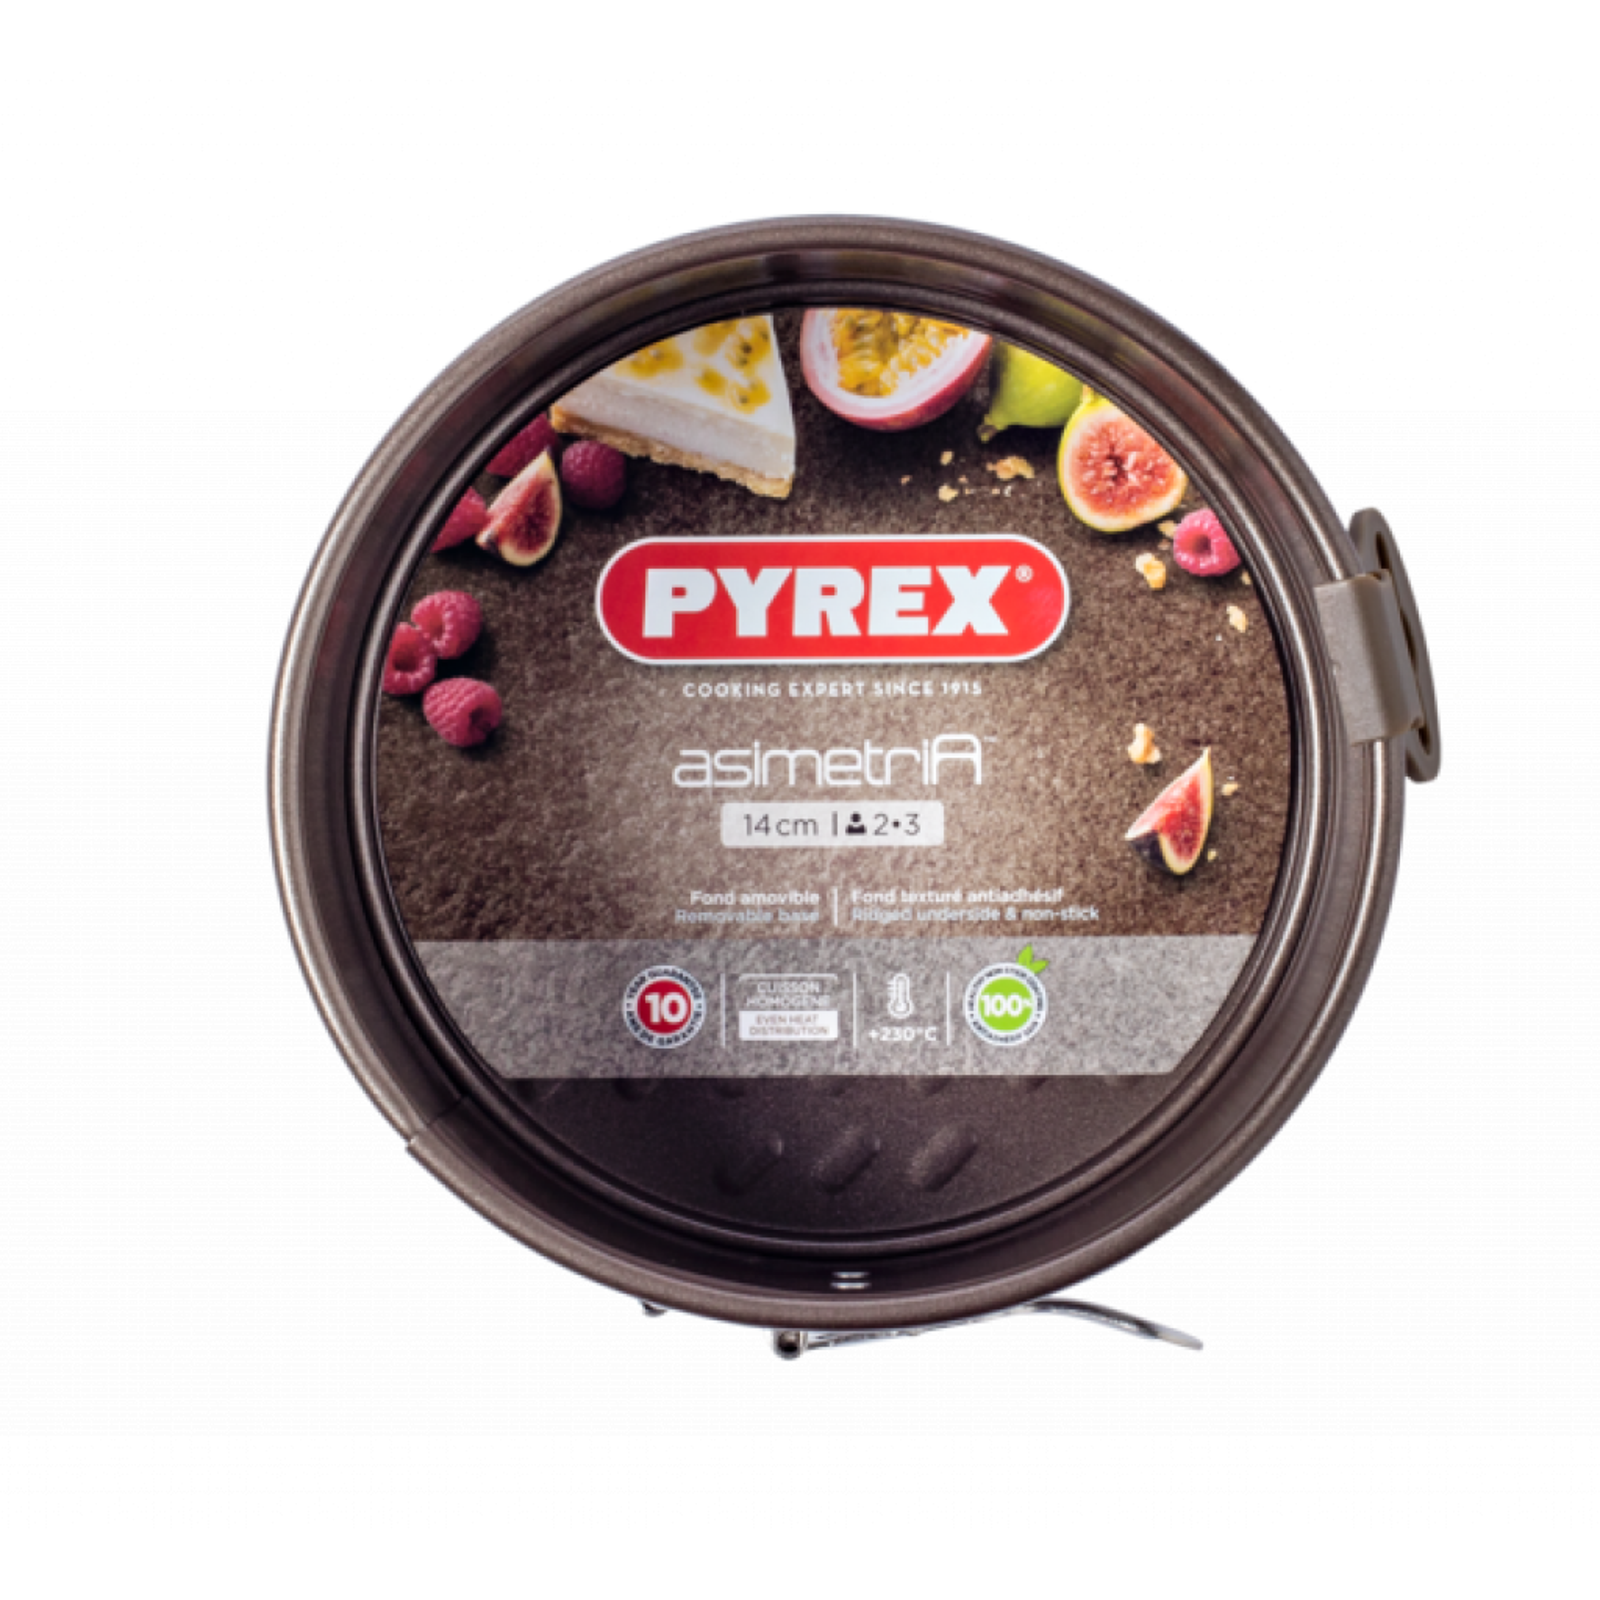 Форма для выпечки Pyrex Asimetria разъемная 14 см (AS14BS0)